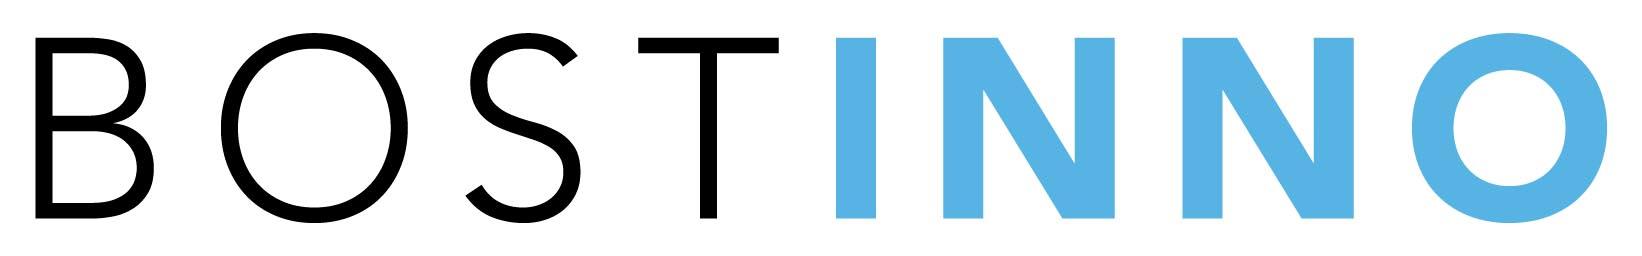 BostInno_Logo.jpg